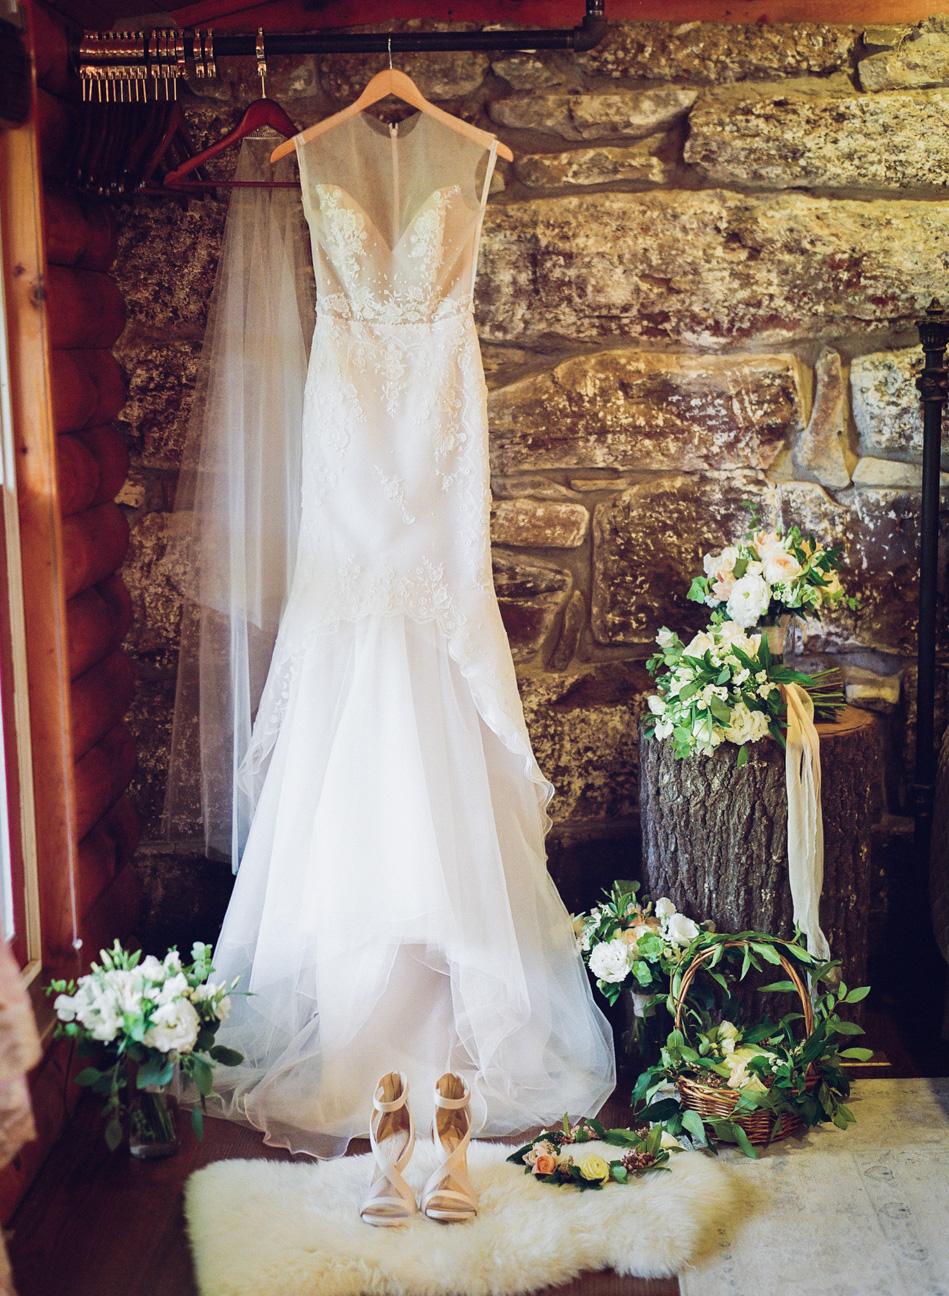 KarenHillPhotography-Parizat-Wedding-0054.jpg